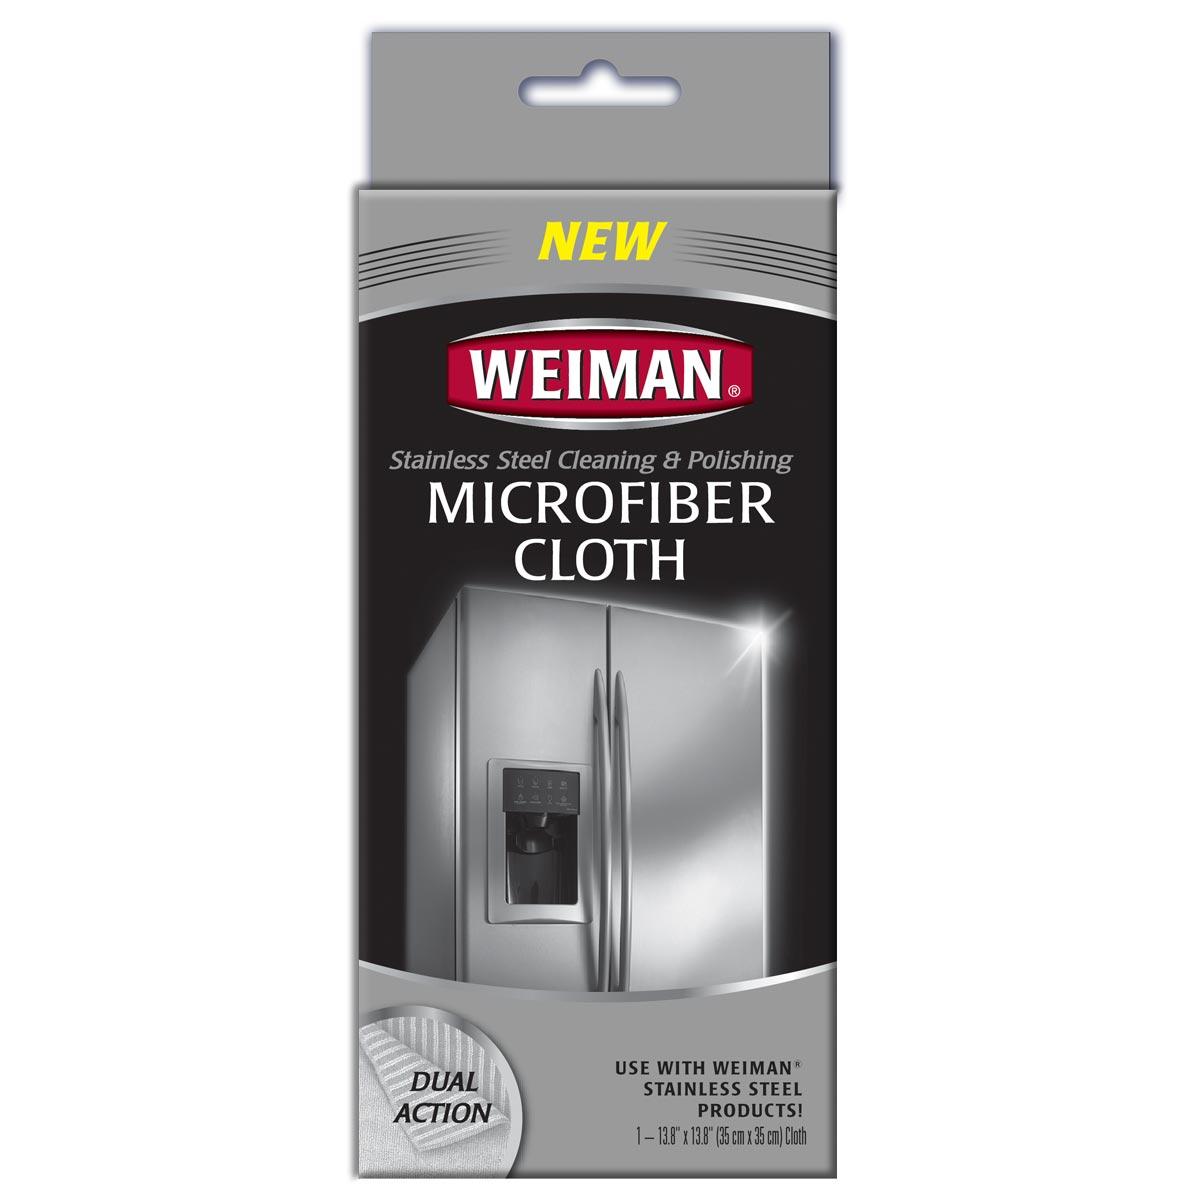 https://googone.com/media/catalog/product/w/e/weiman-microfiber-cloth-for-stainless-steel_front_4.jpg